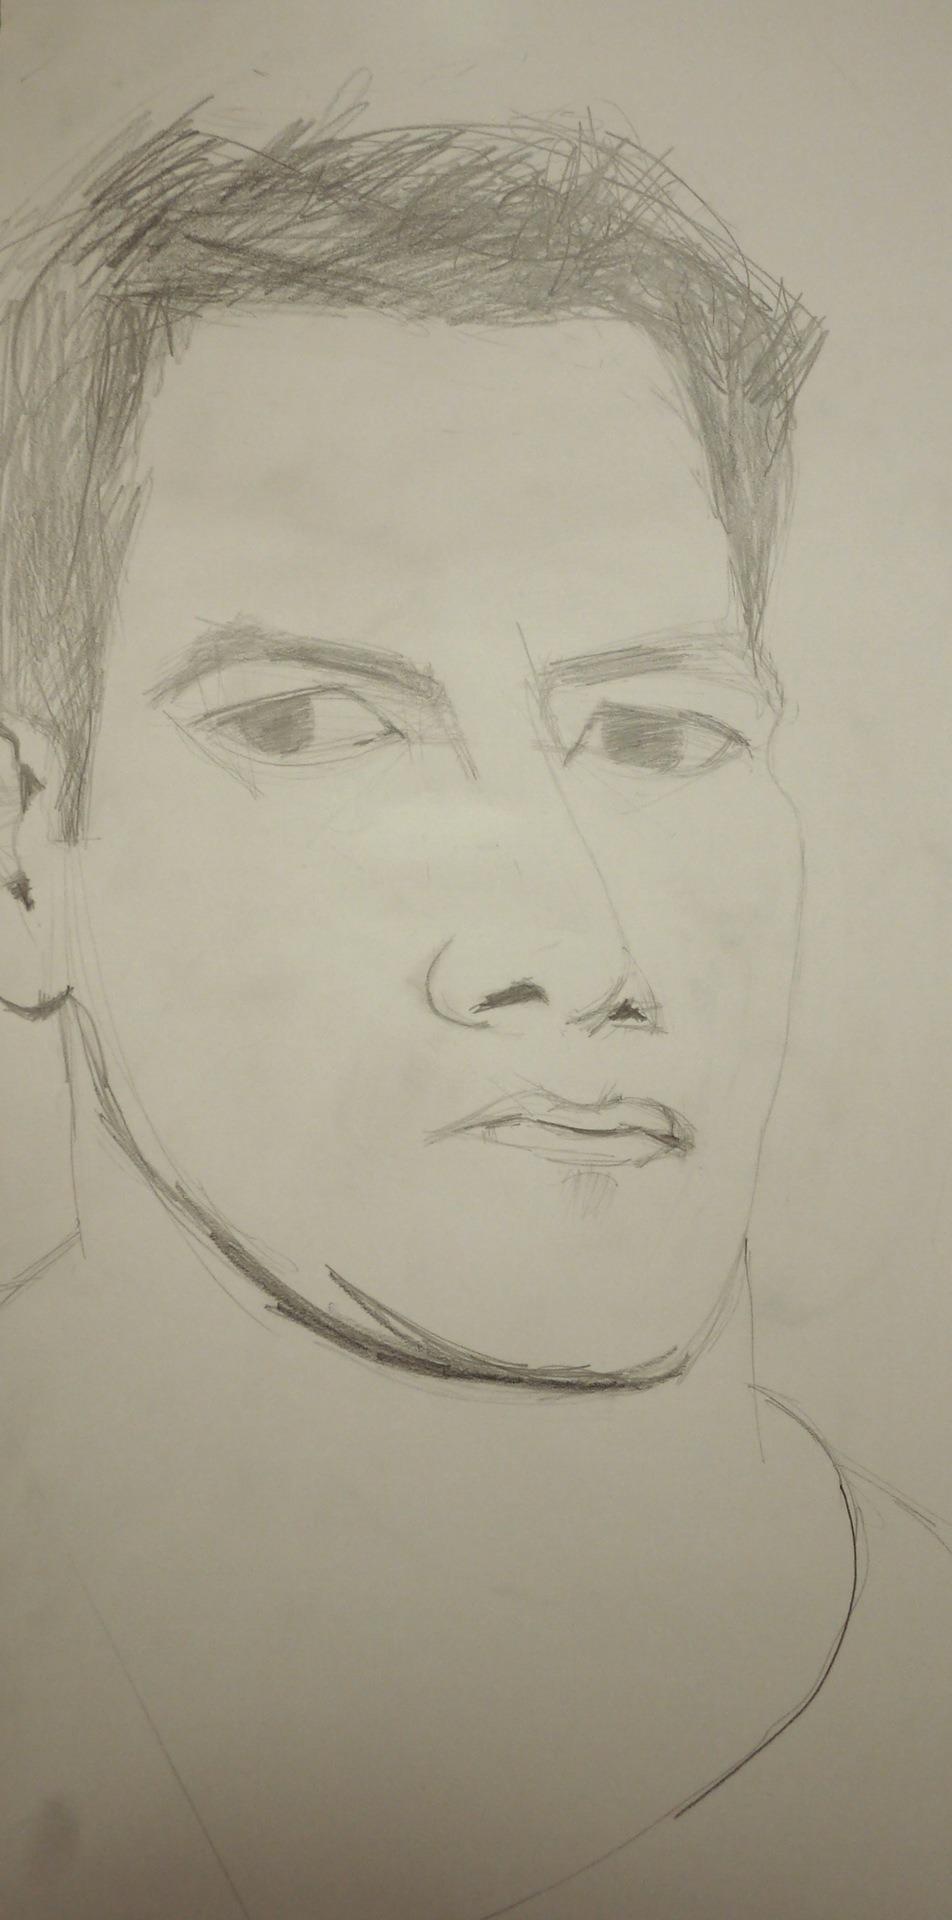 Self-Portrait Challenge - Day 5